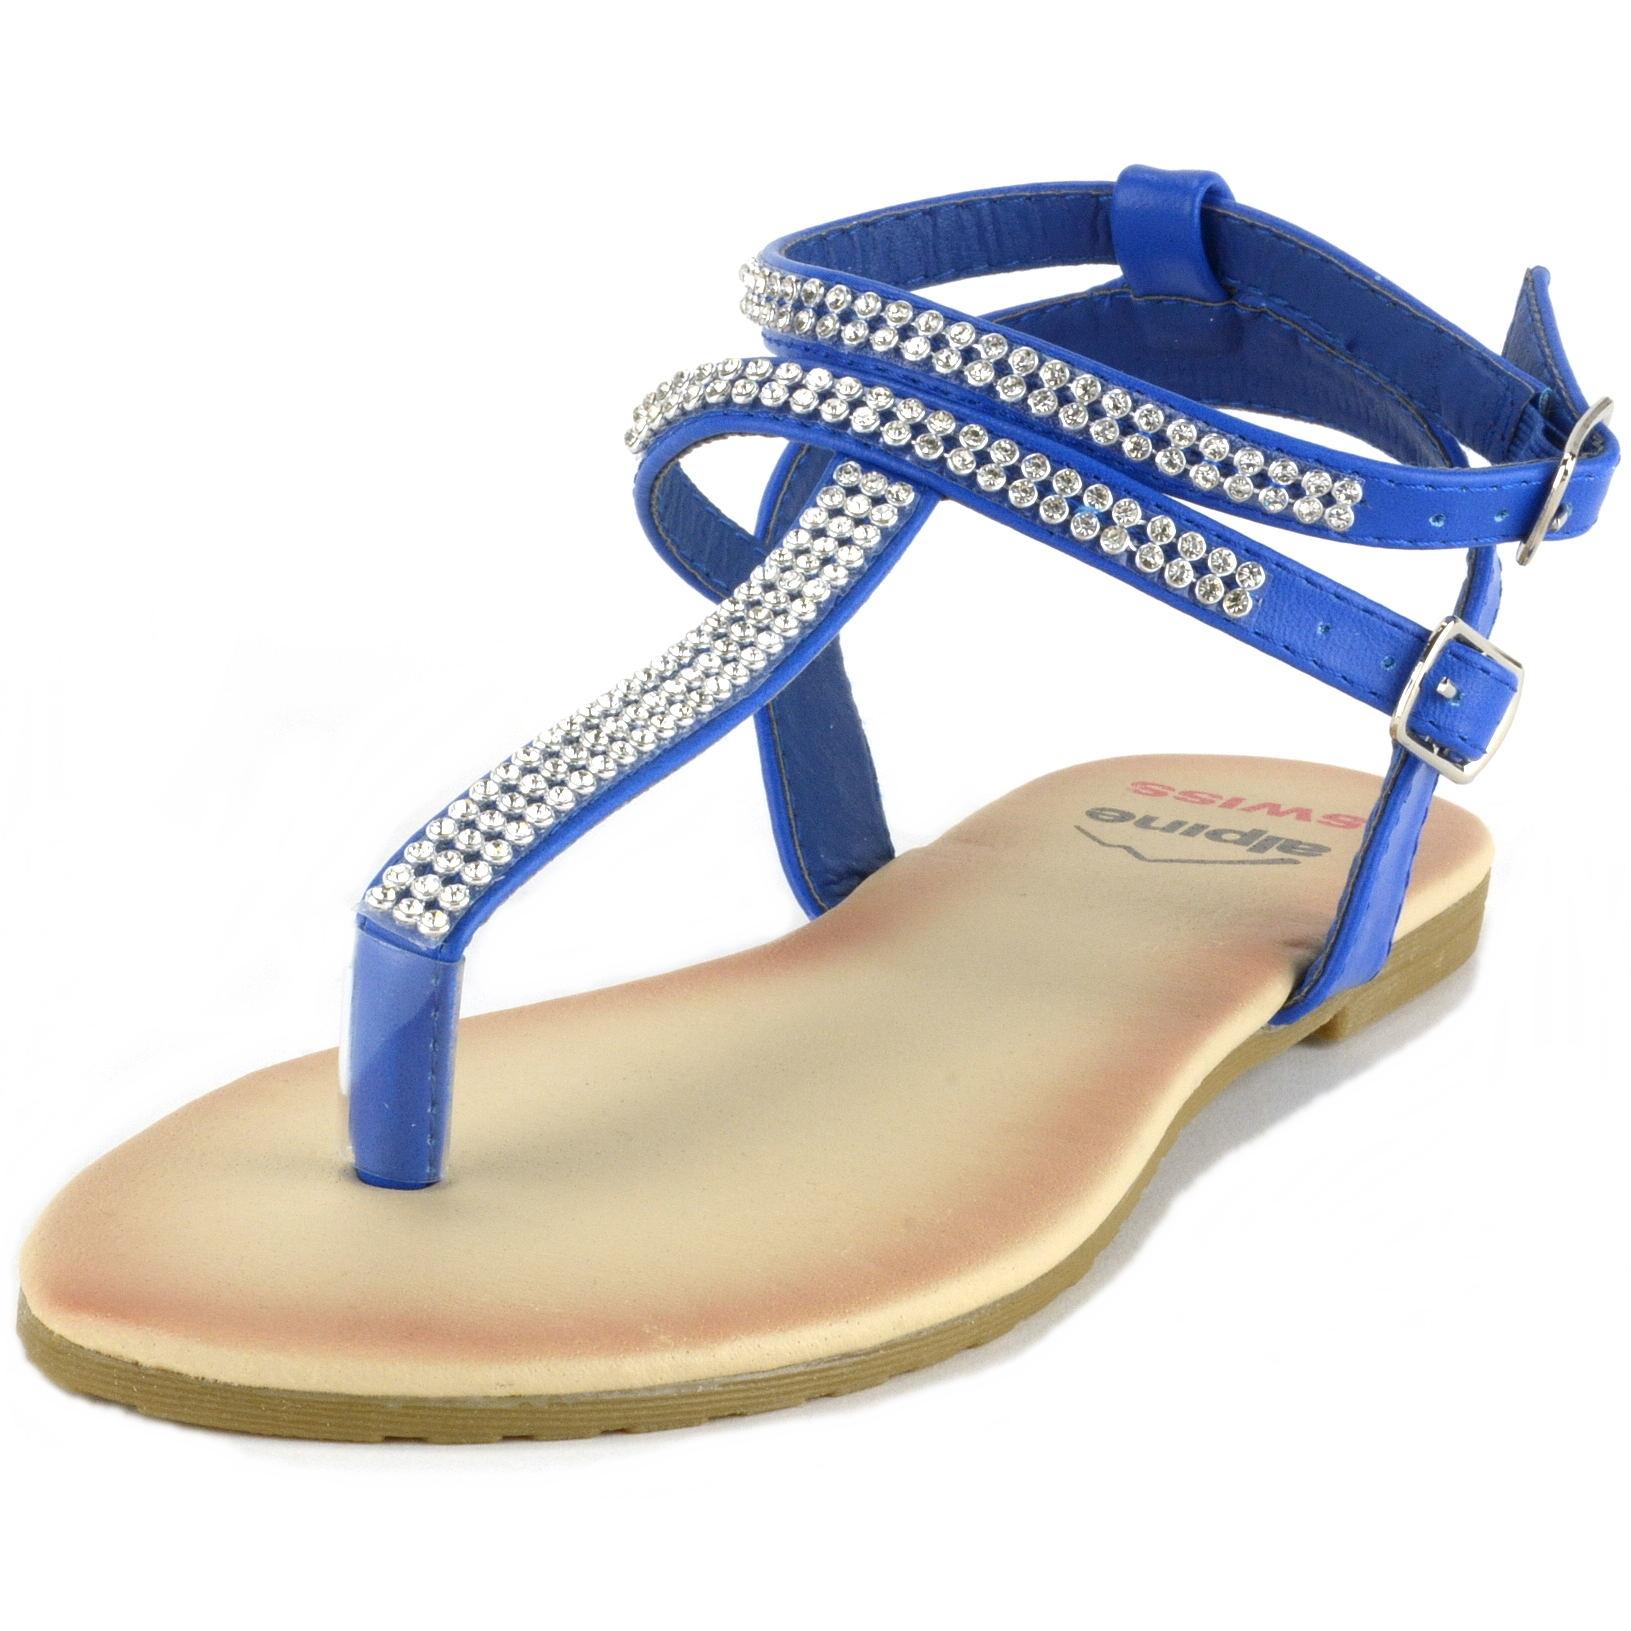 Alpine Swiss Women's Gladiator Sandals T-Strap Slingback Roman Rhinestone Flats